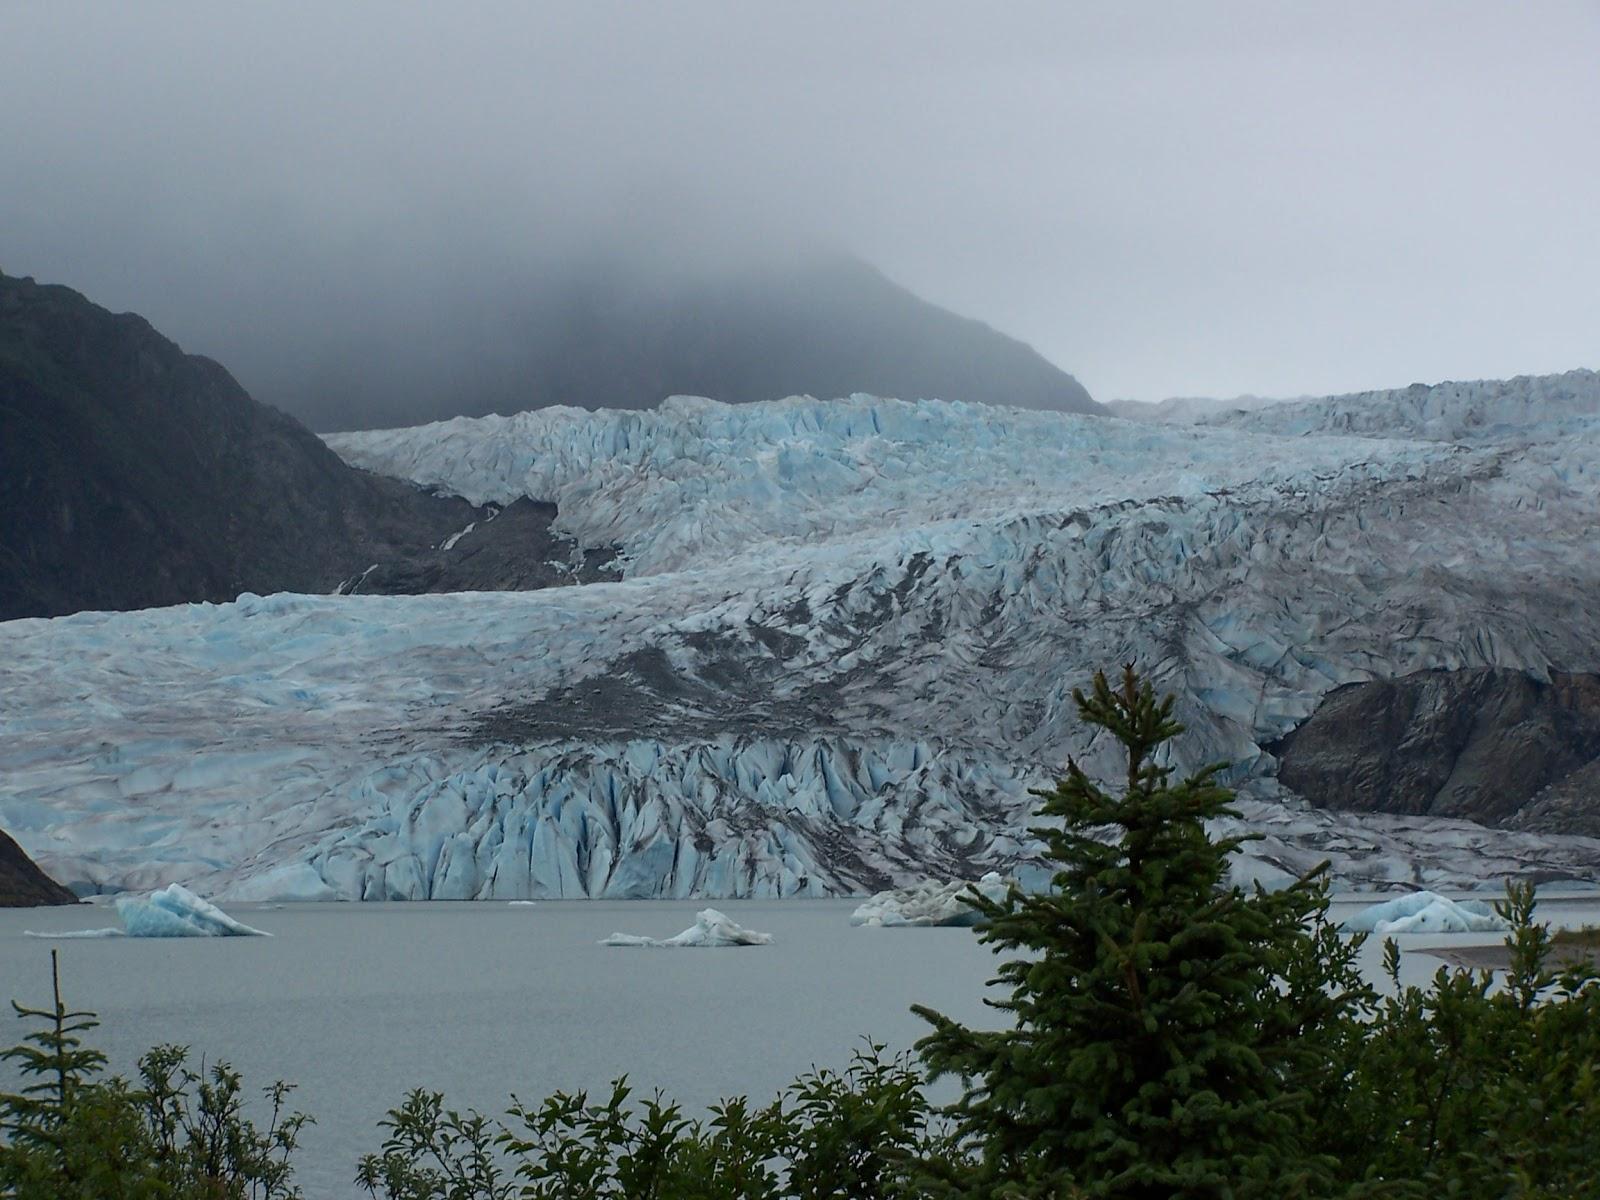 http://1.bp.blogspot.com/-uoAw-k5MV2Y/T2uRUGCAPpI/AAAAAAAADJQ/JNEatckQgeI/s1600/Alaska-June-2005+031.jpg